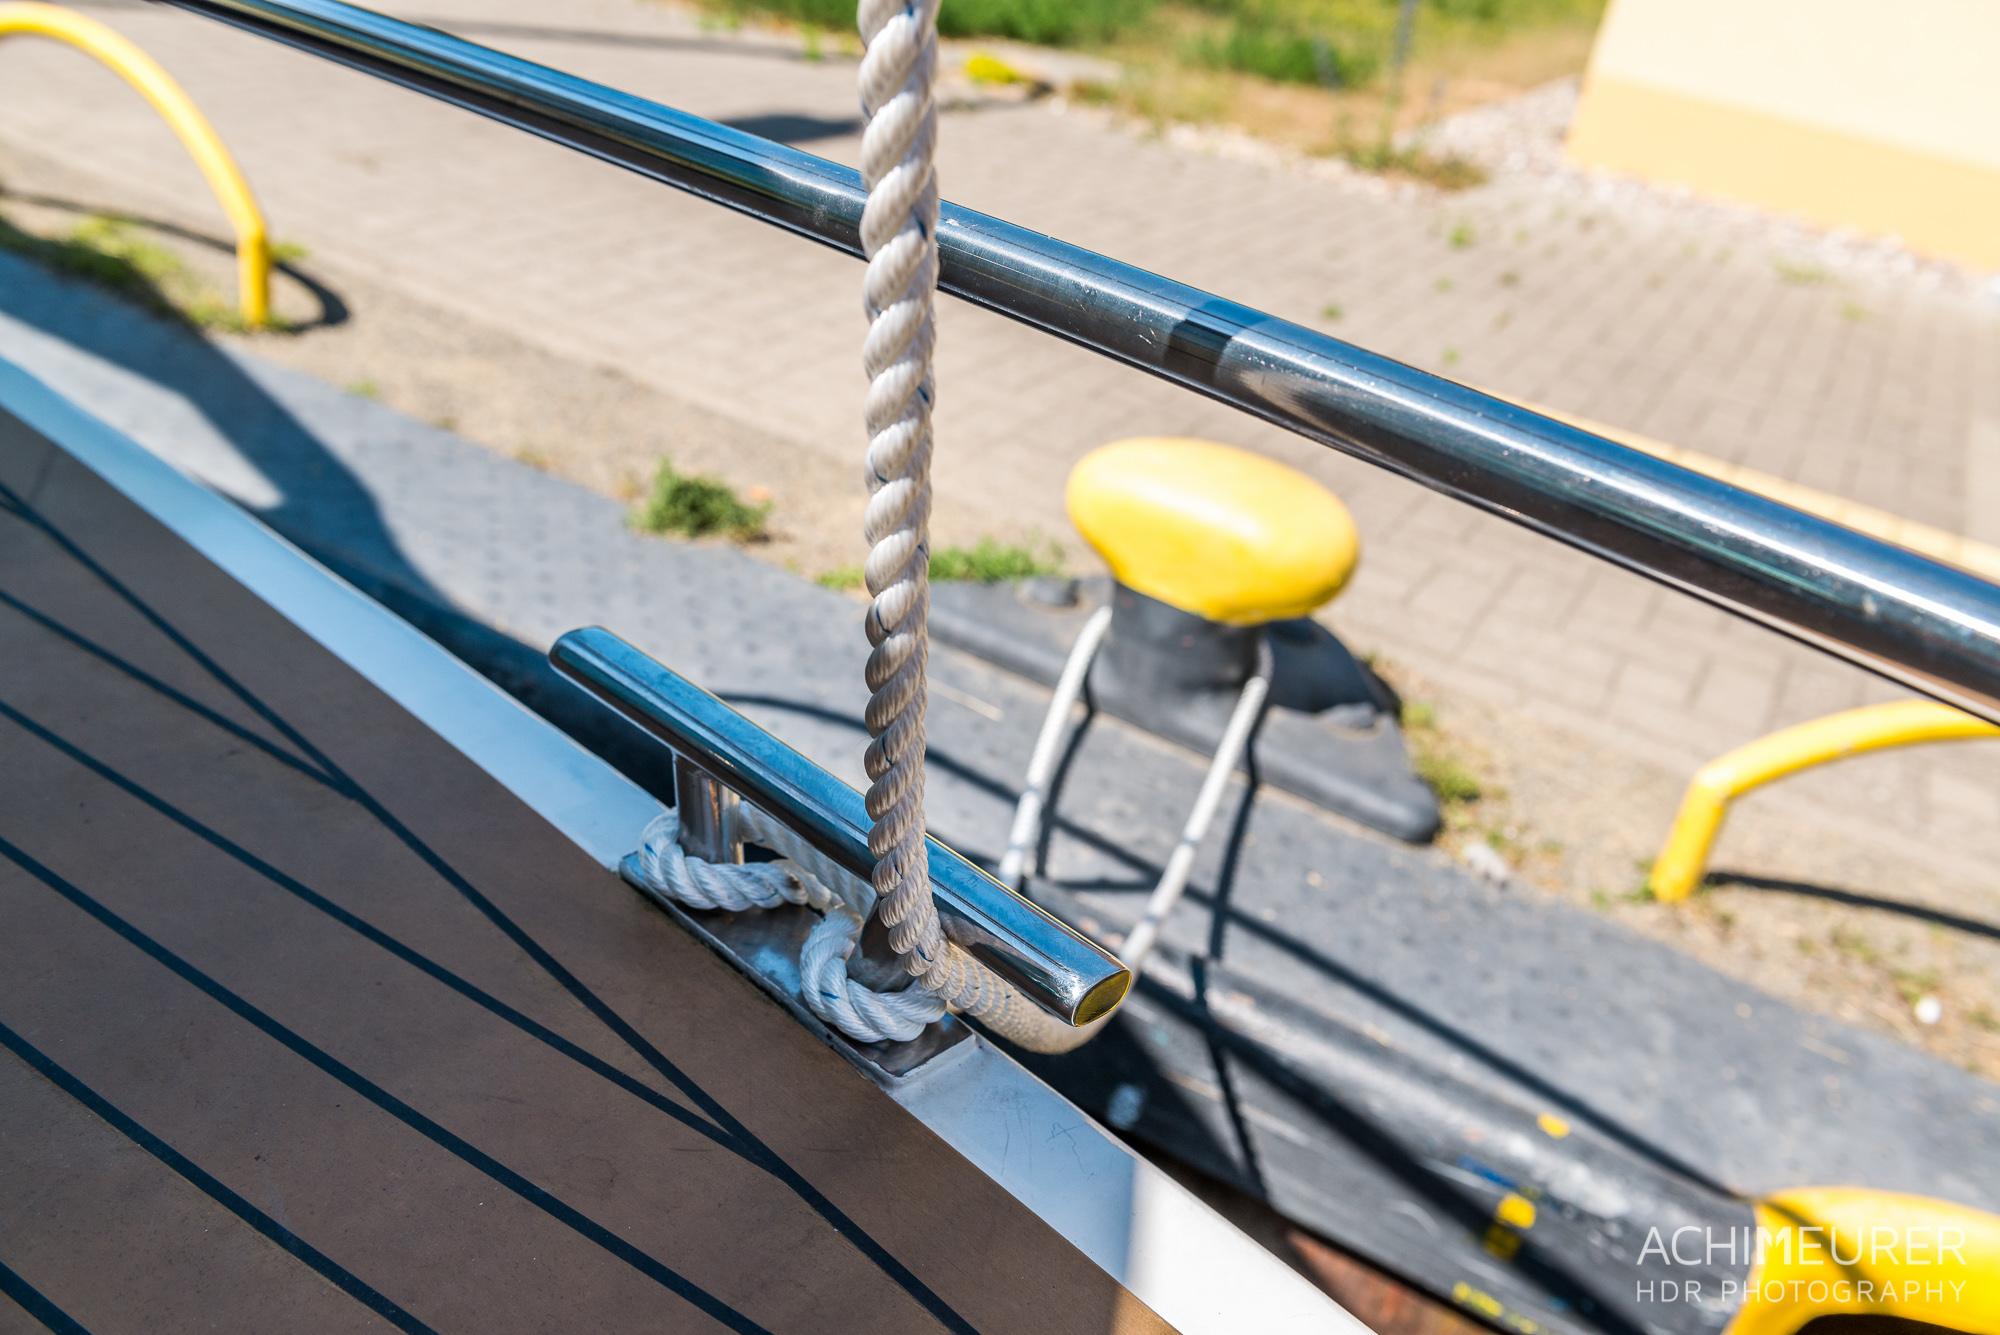 Hausboot-Kuhnle-Mueritz-Mecklenburg-Vorpommern-See_3195